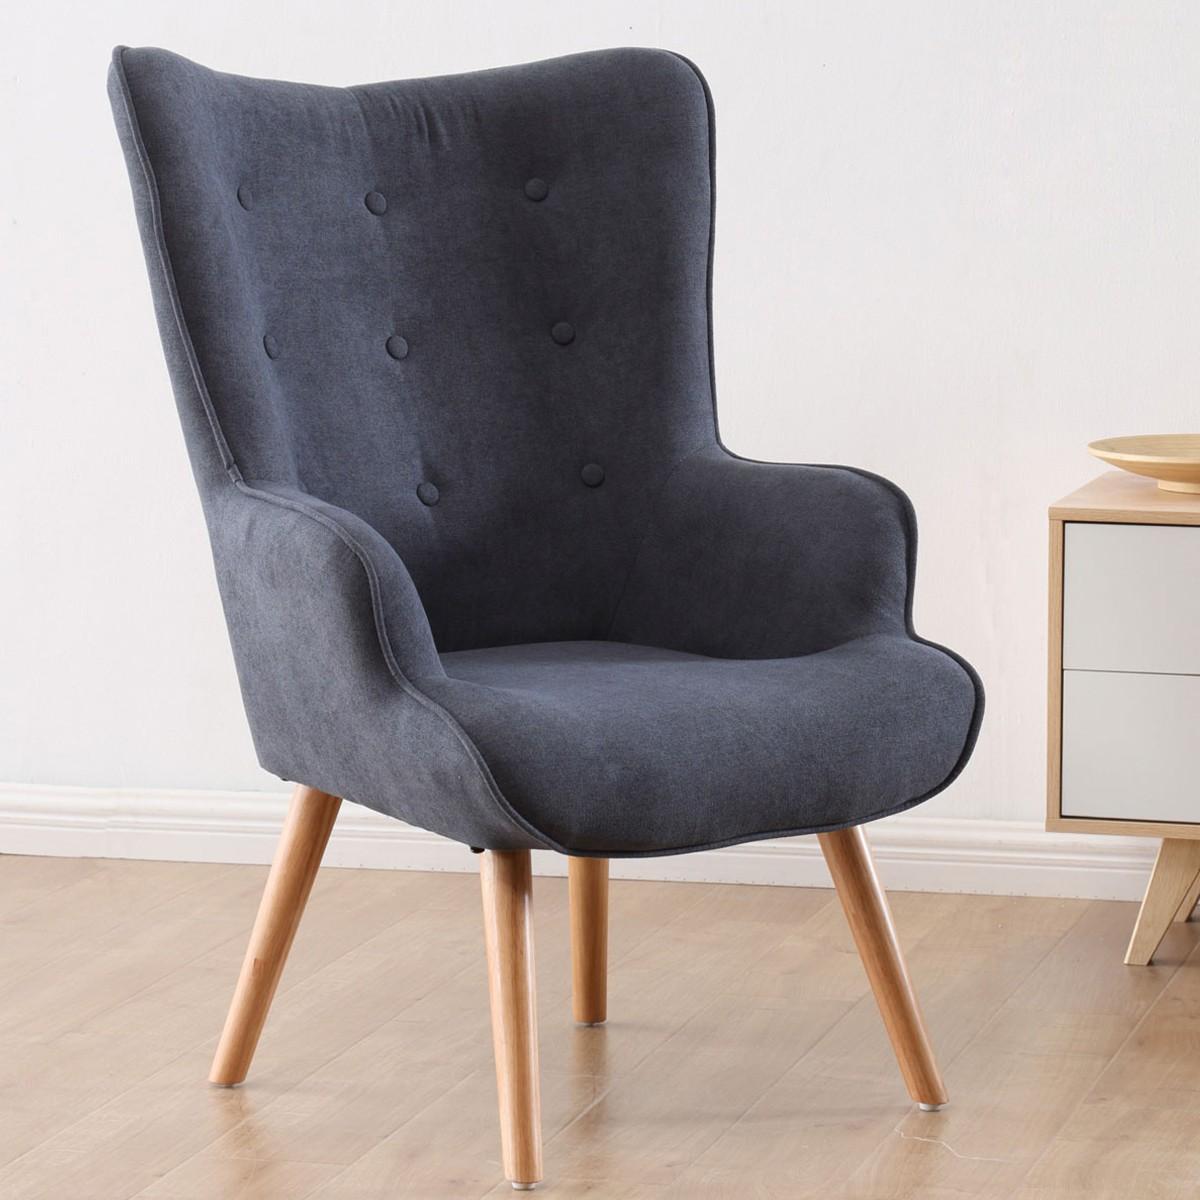 Modern design armchair.